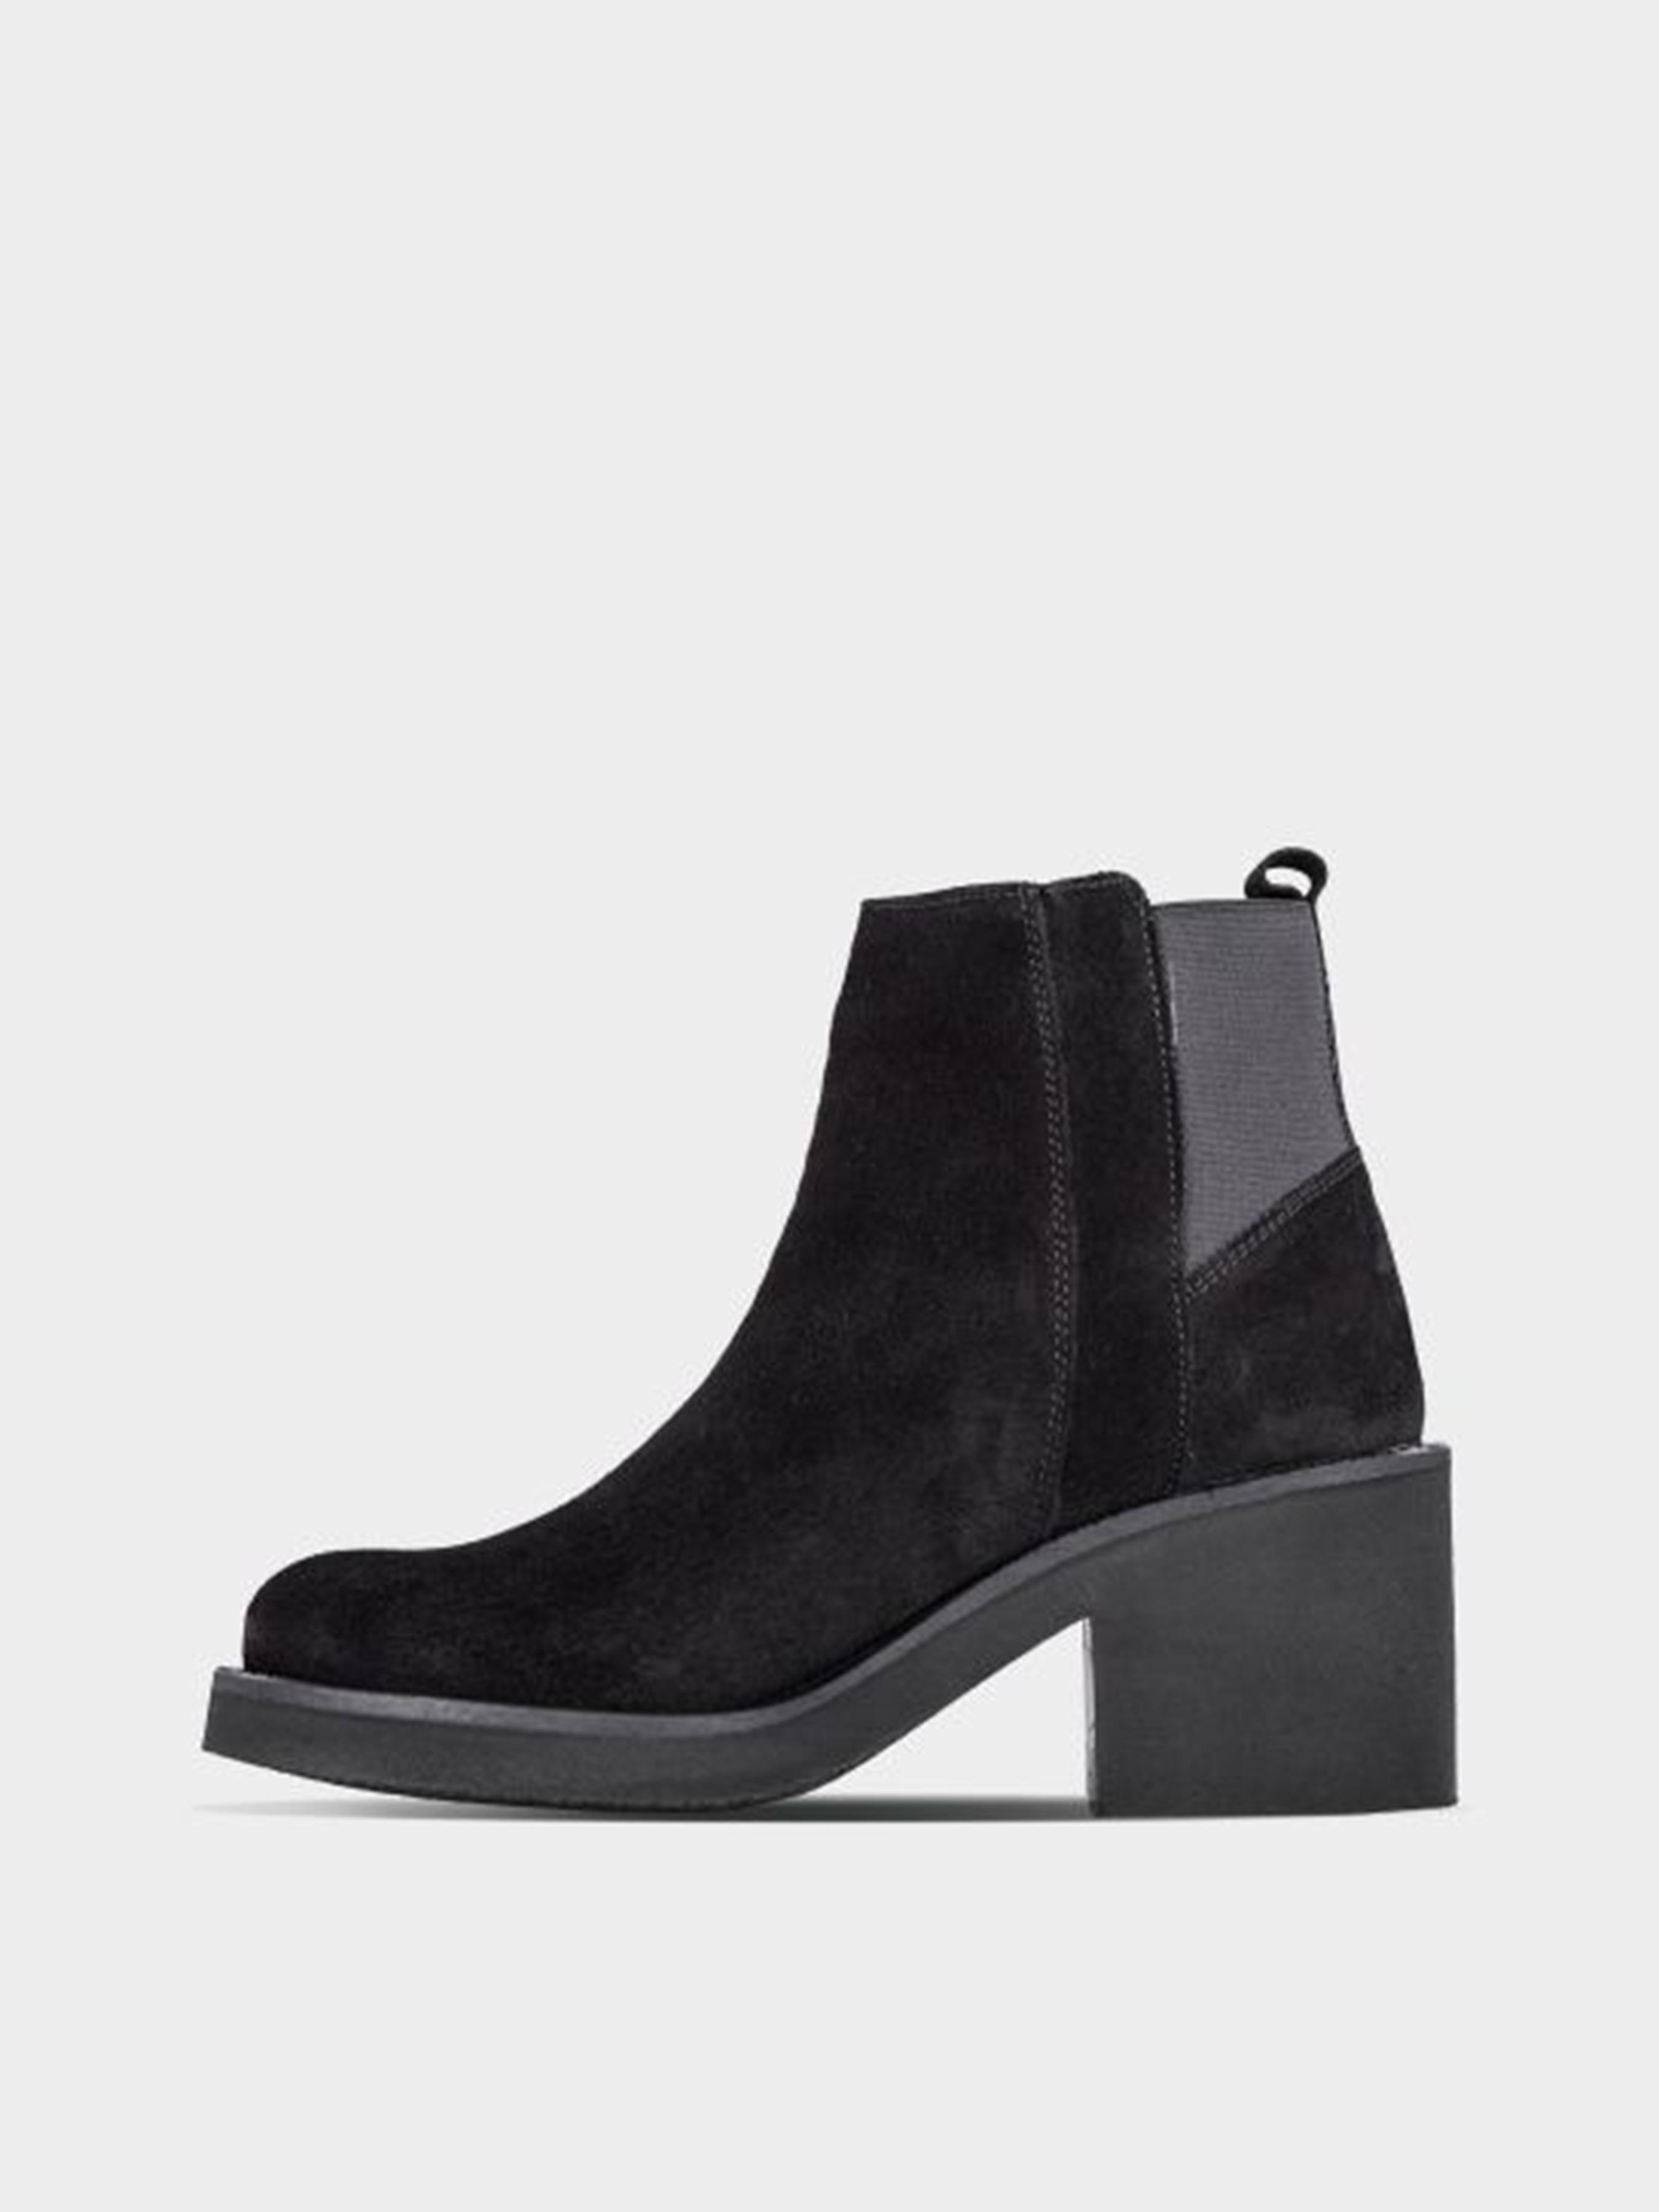 Ботинки для женщин Camalini MIU 0E7 продажа, 2017